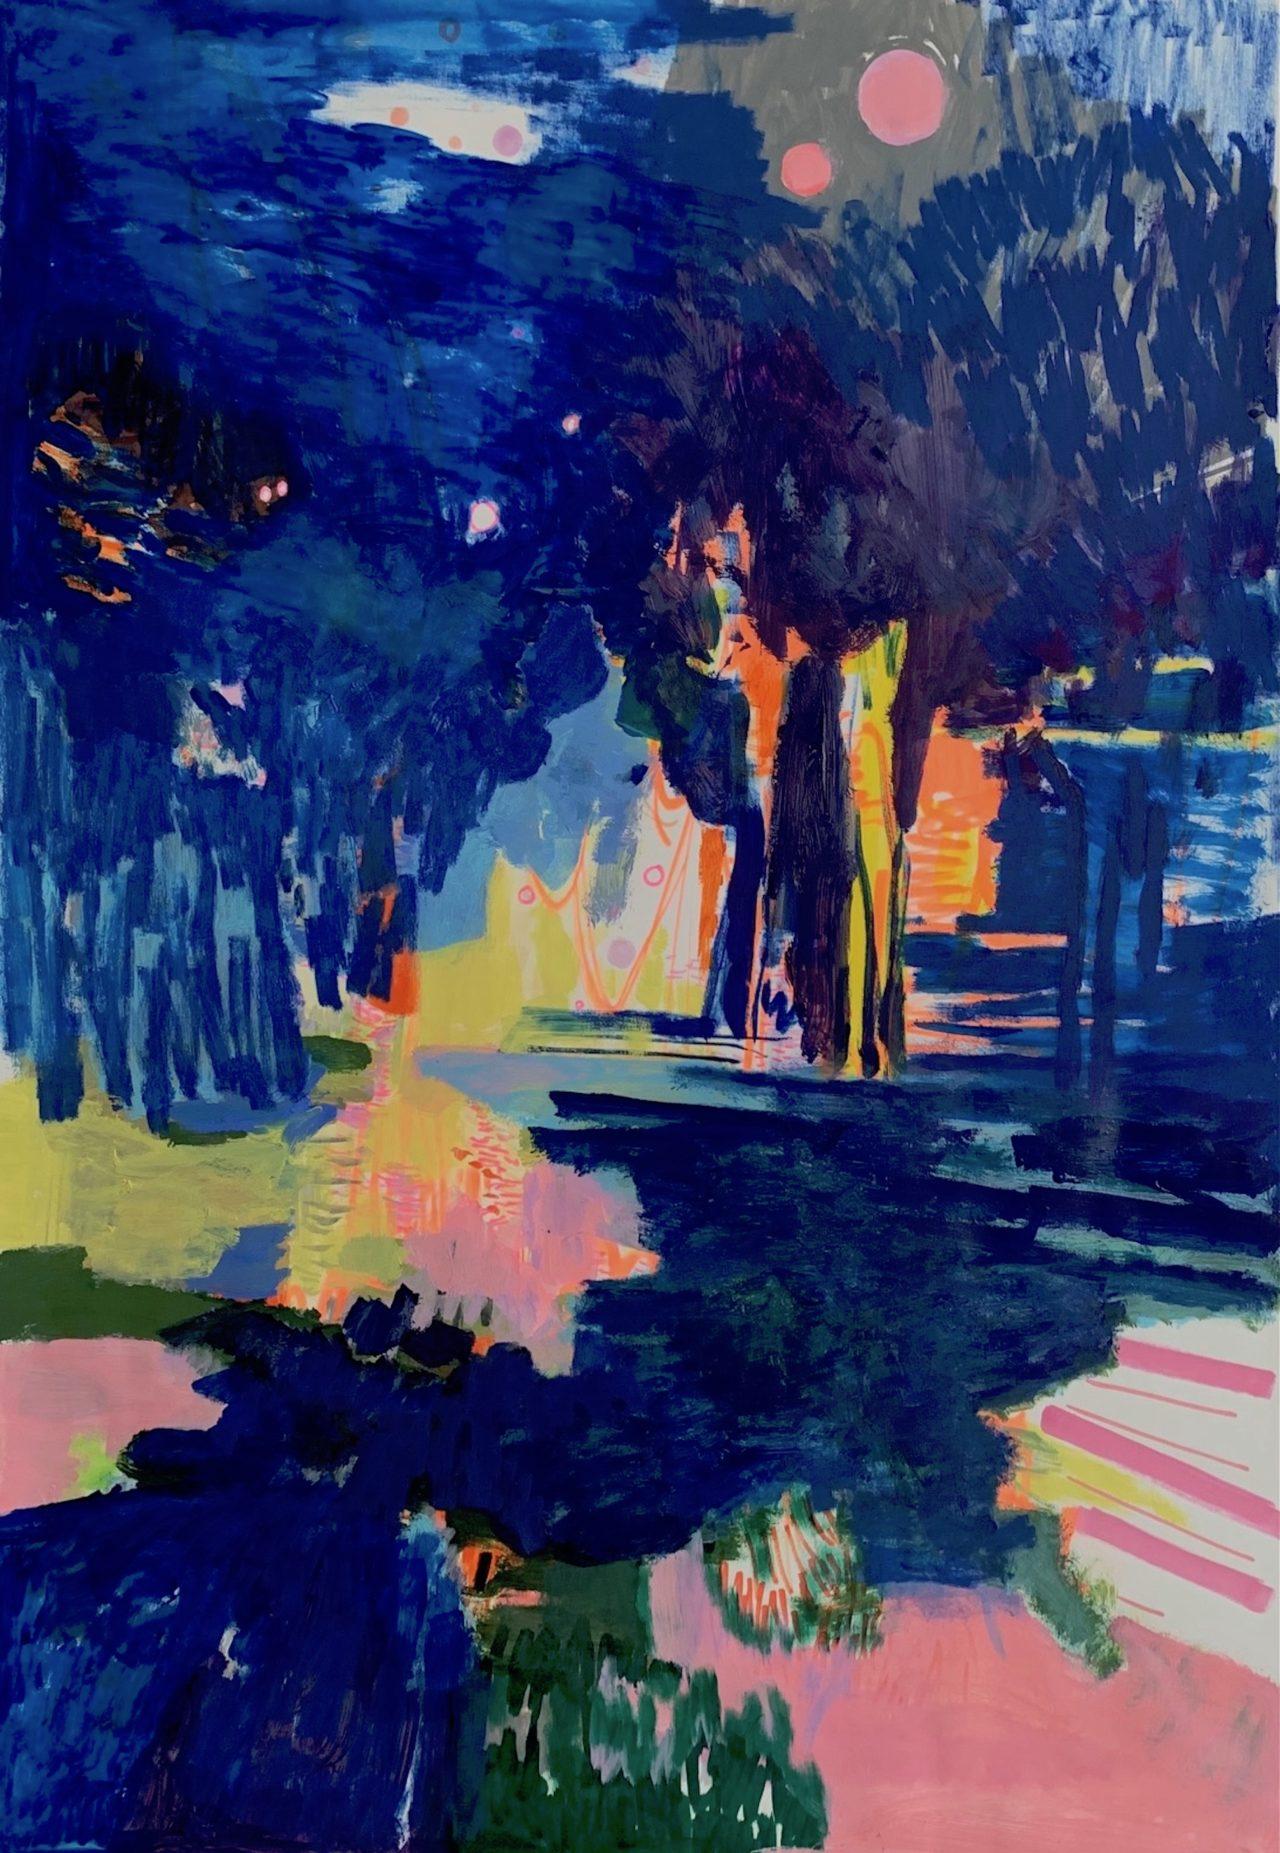 Nachts, 100 x 70 cm, Acryl, Kreide- und Lackstifte auf Papier, 2021